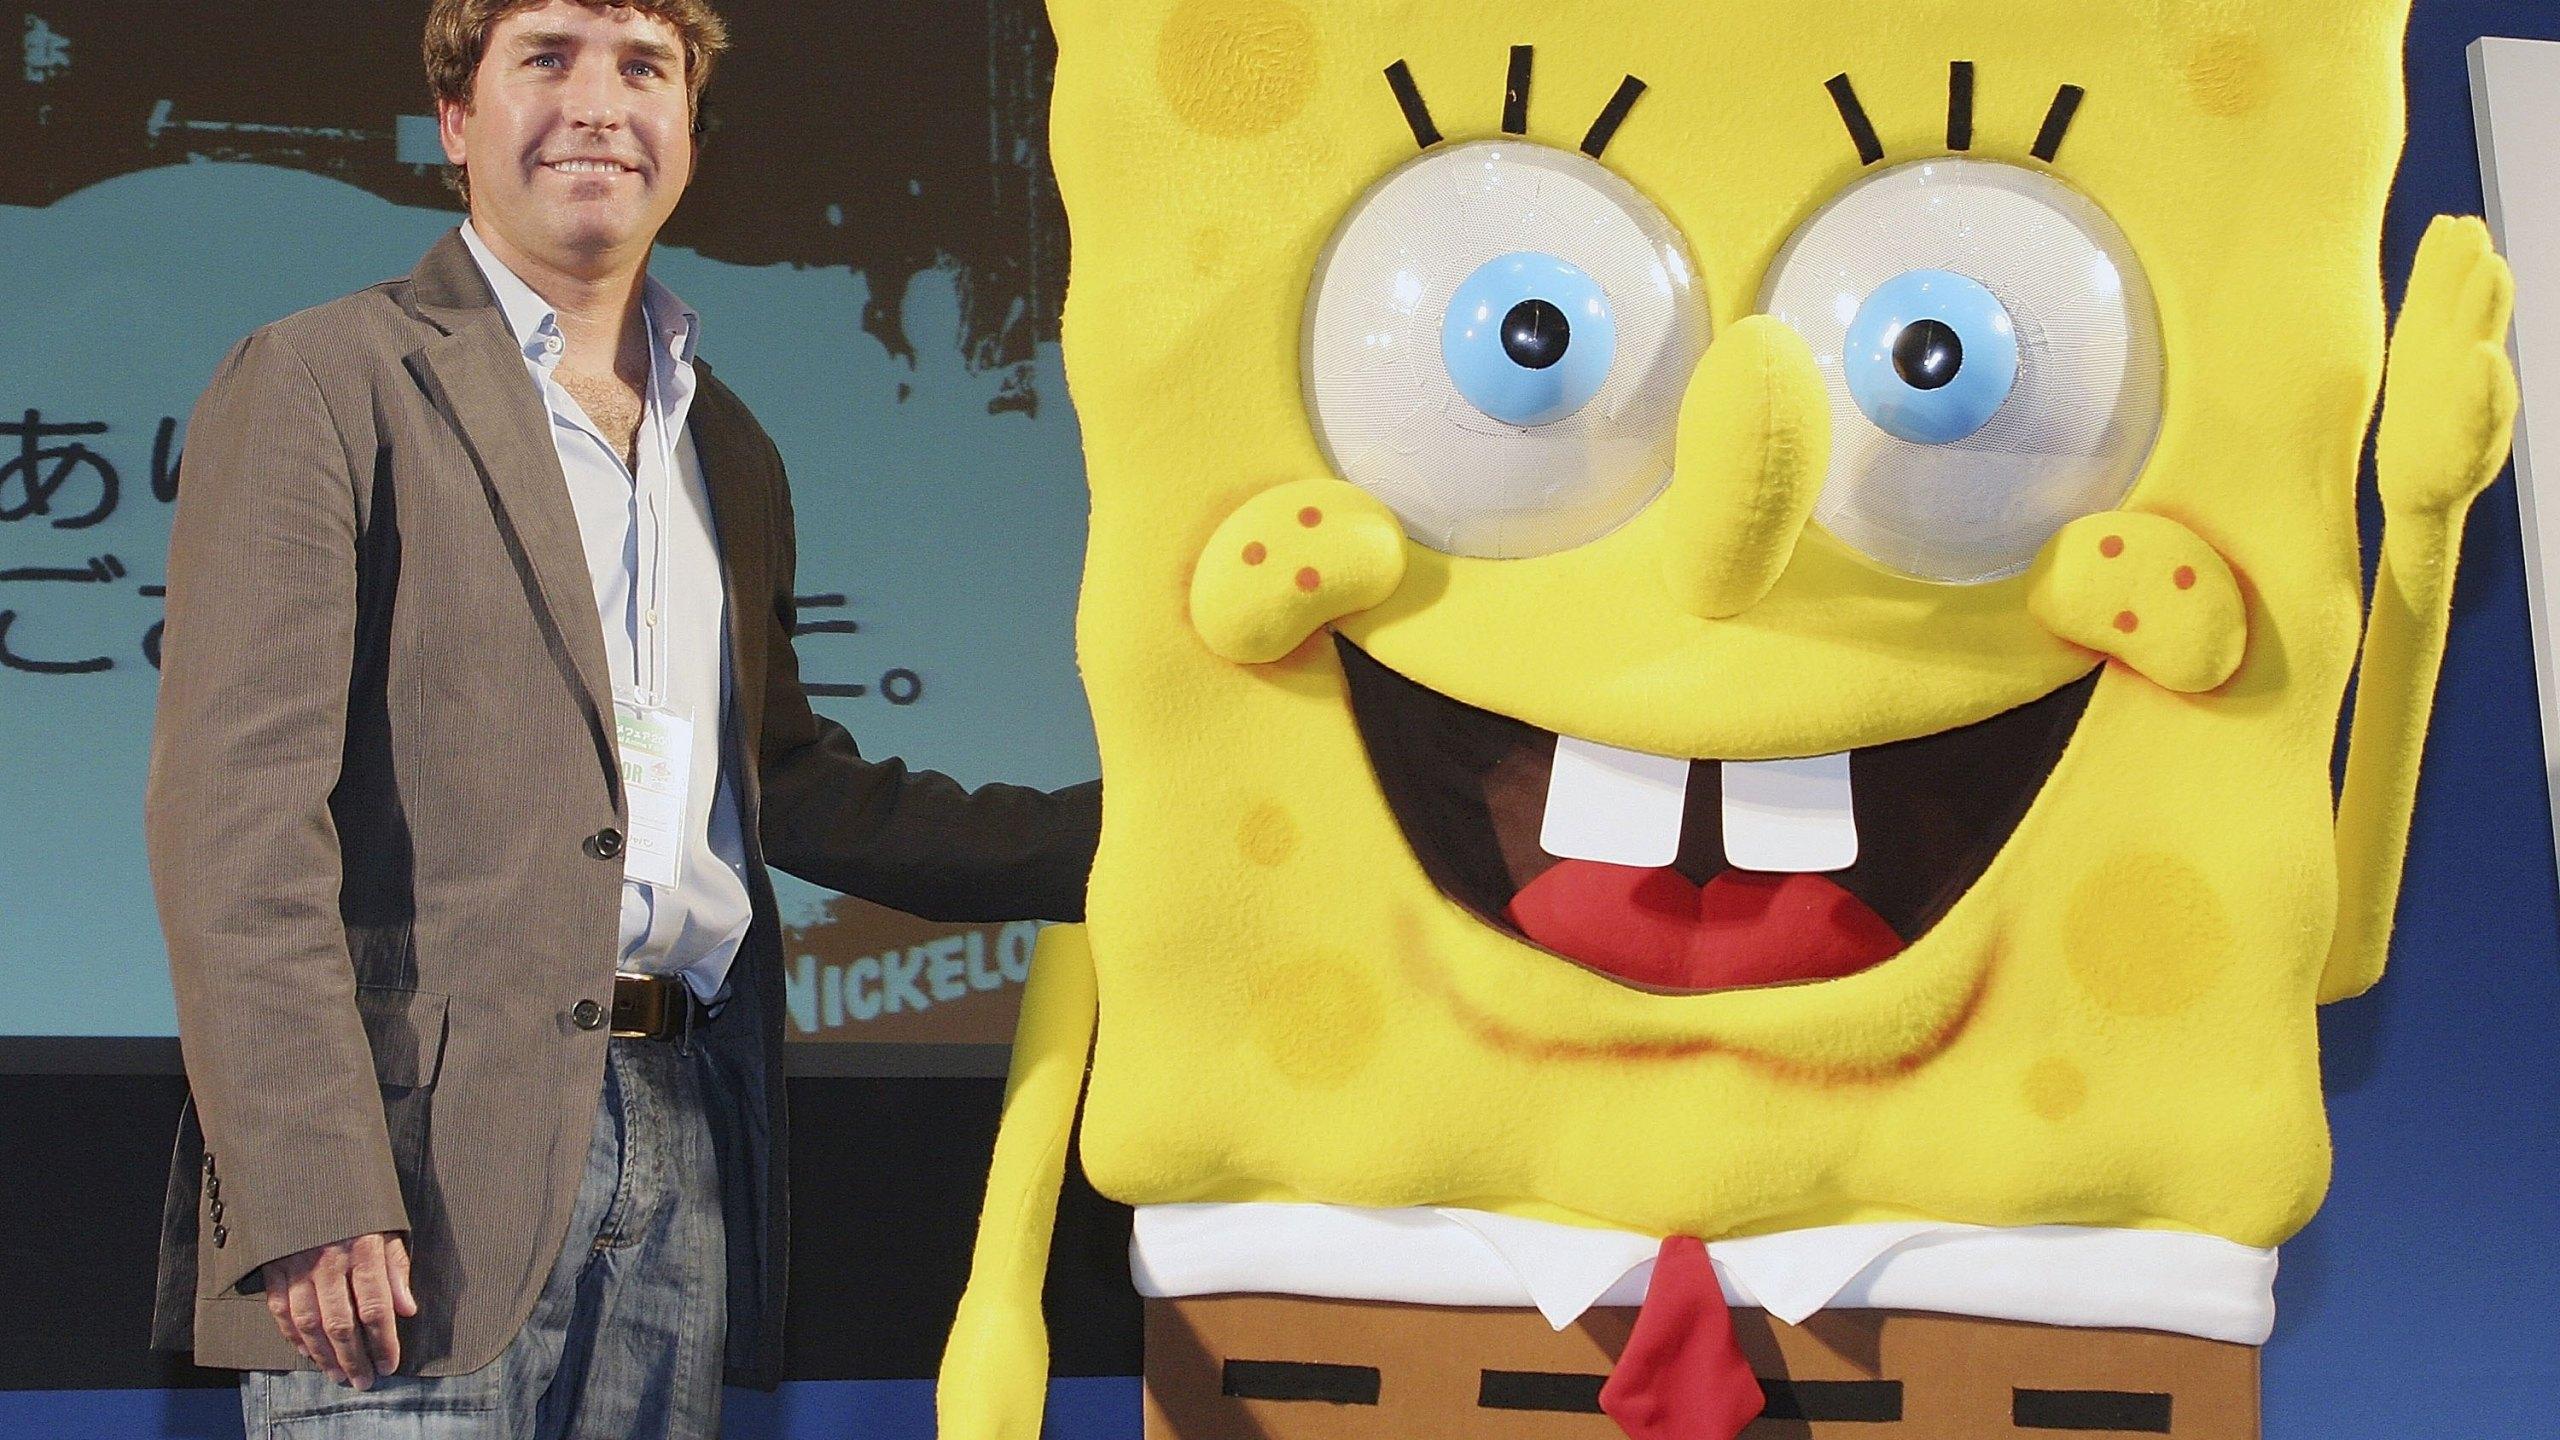 Spongebob Squarepants 57154548JK003_SpongeBob_1543342857434